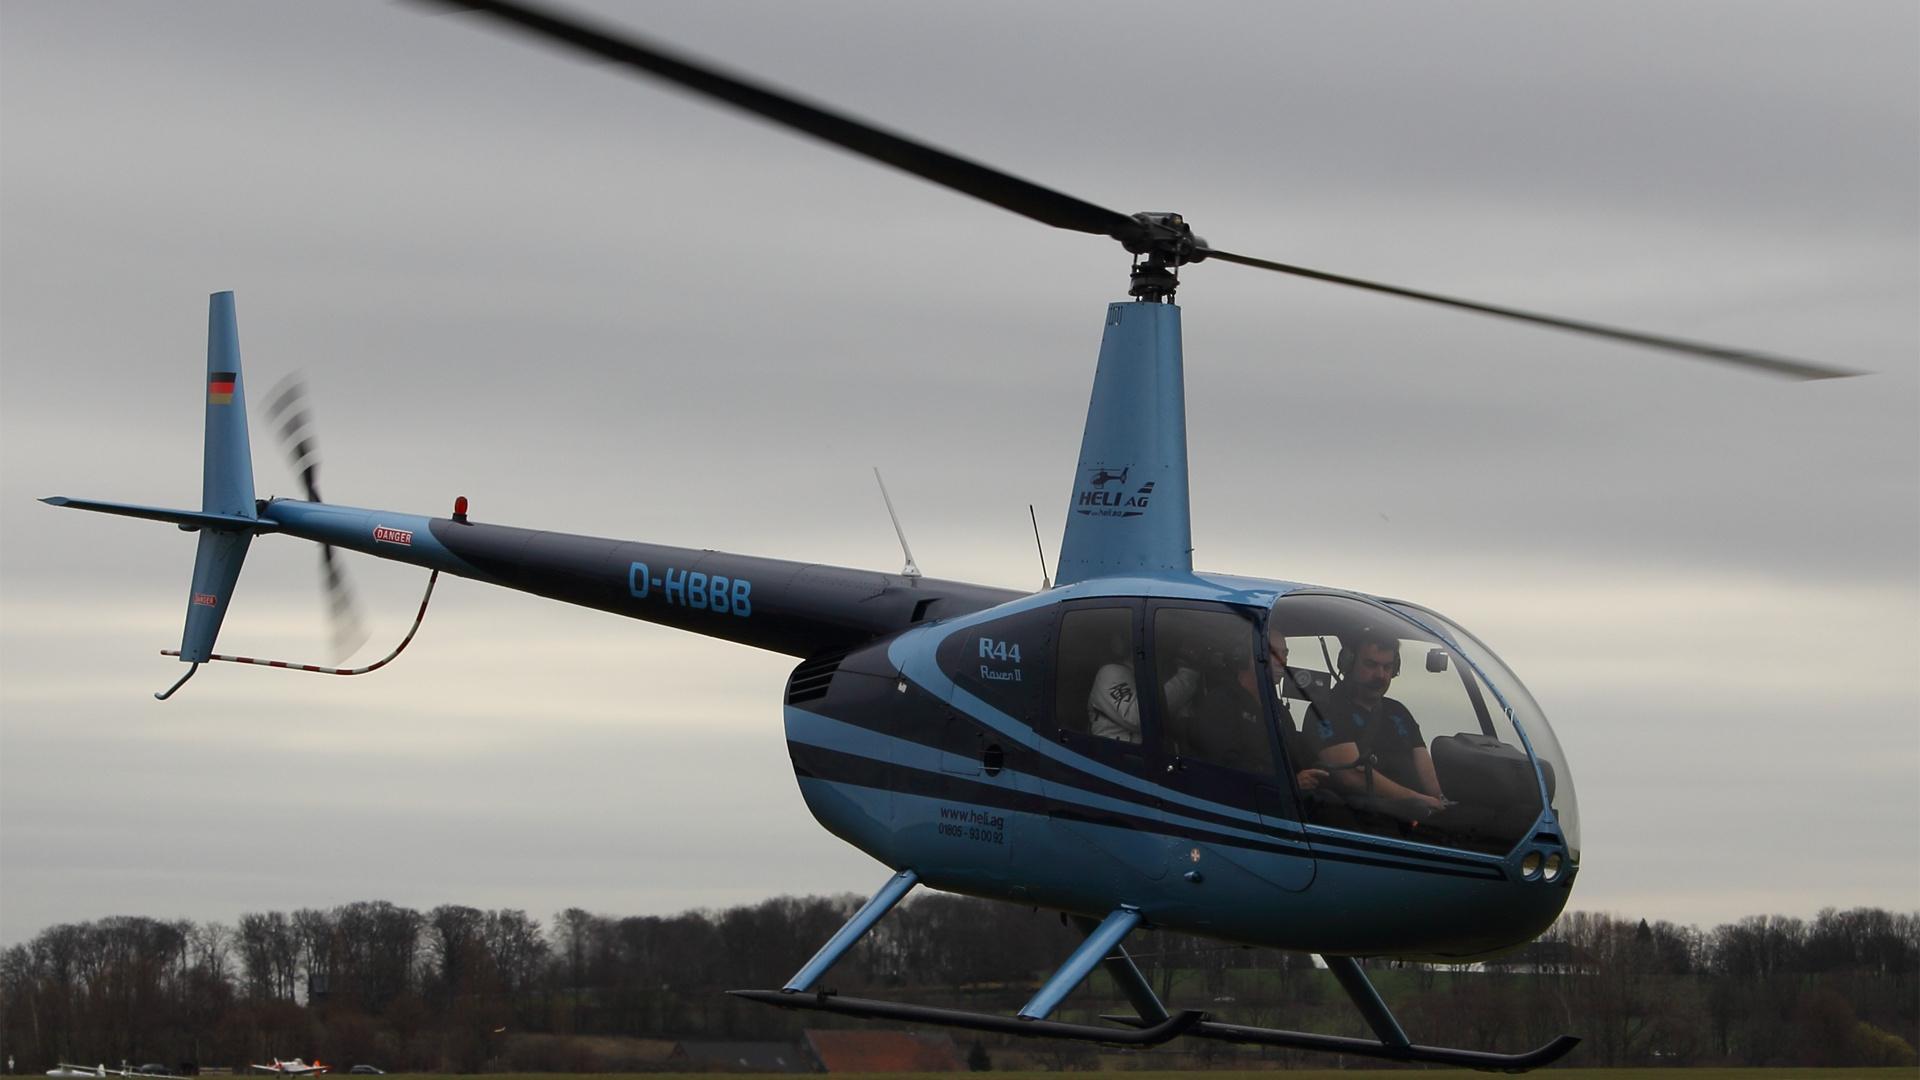 D-HBBB-1 R44 ESS 201304